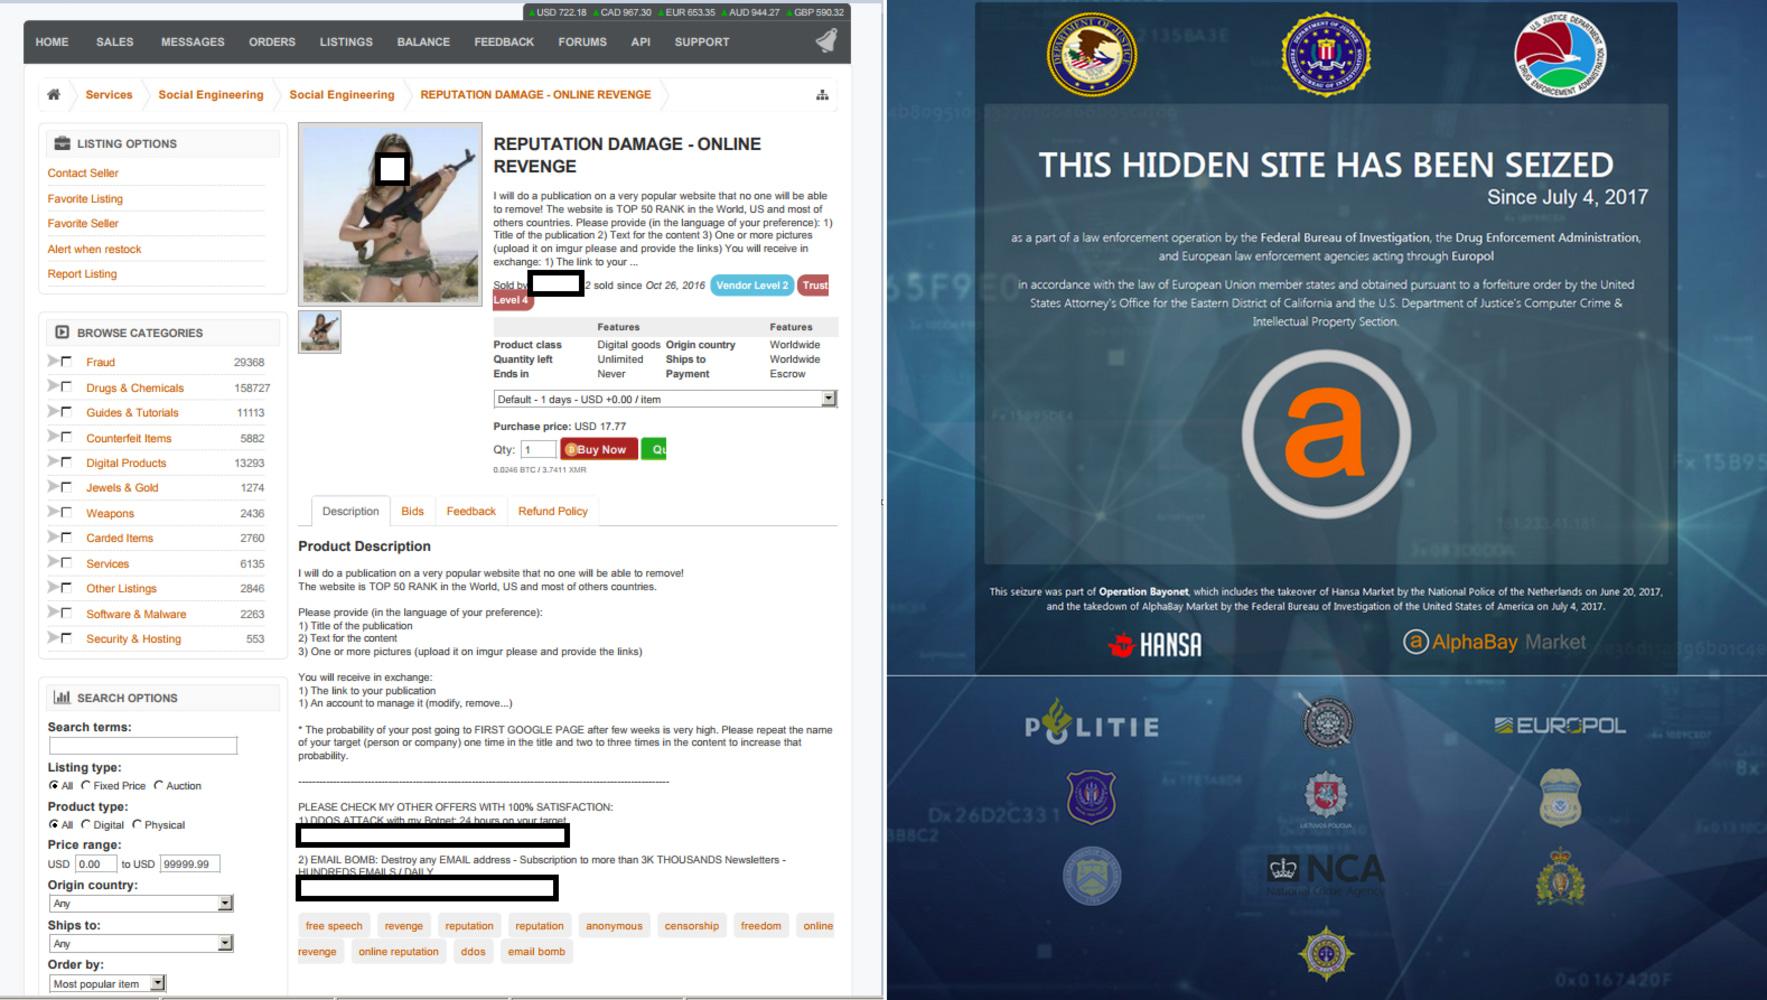 Image result for AlphaBay